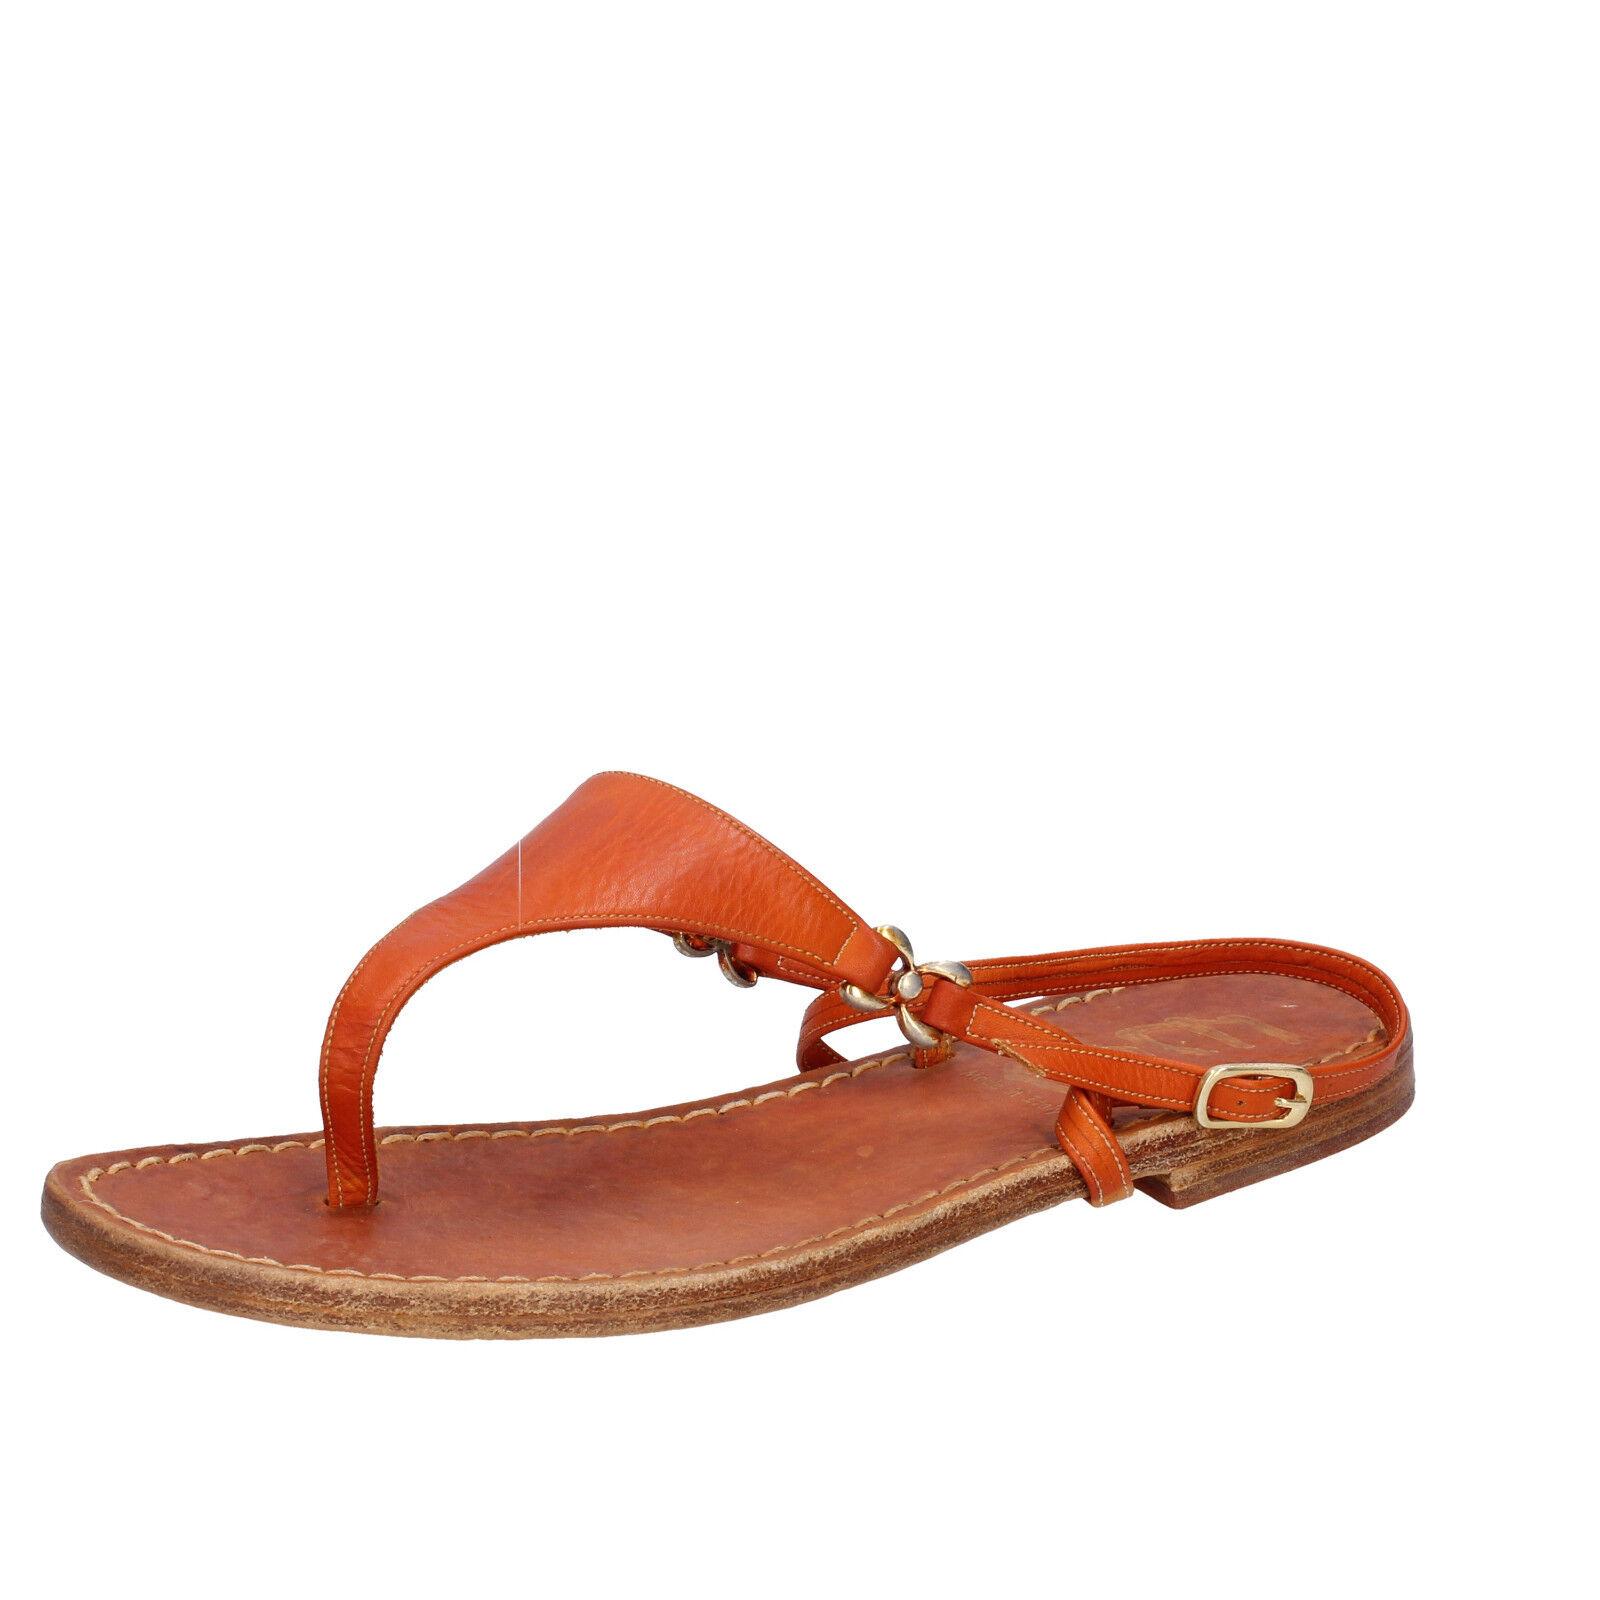 Zapatos para para para mujer Eddy Daniele 4 (EU 37) Sandalias De Cuero Naranja AW402-37  artículos novedosos